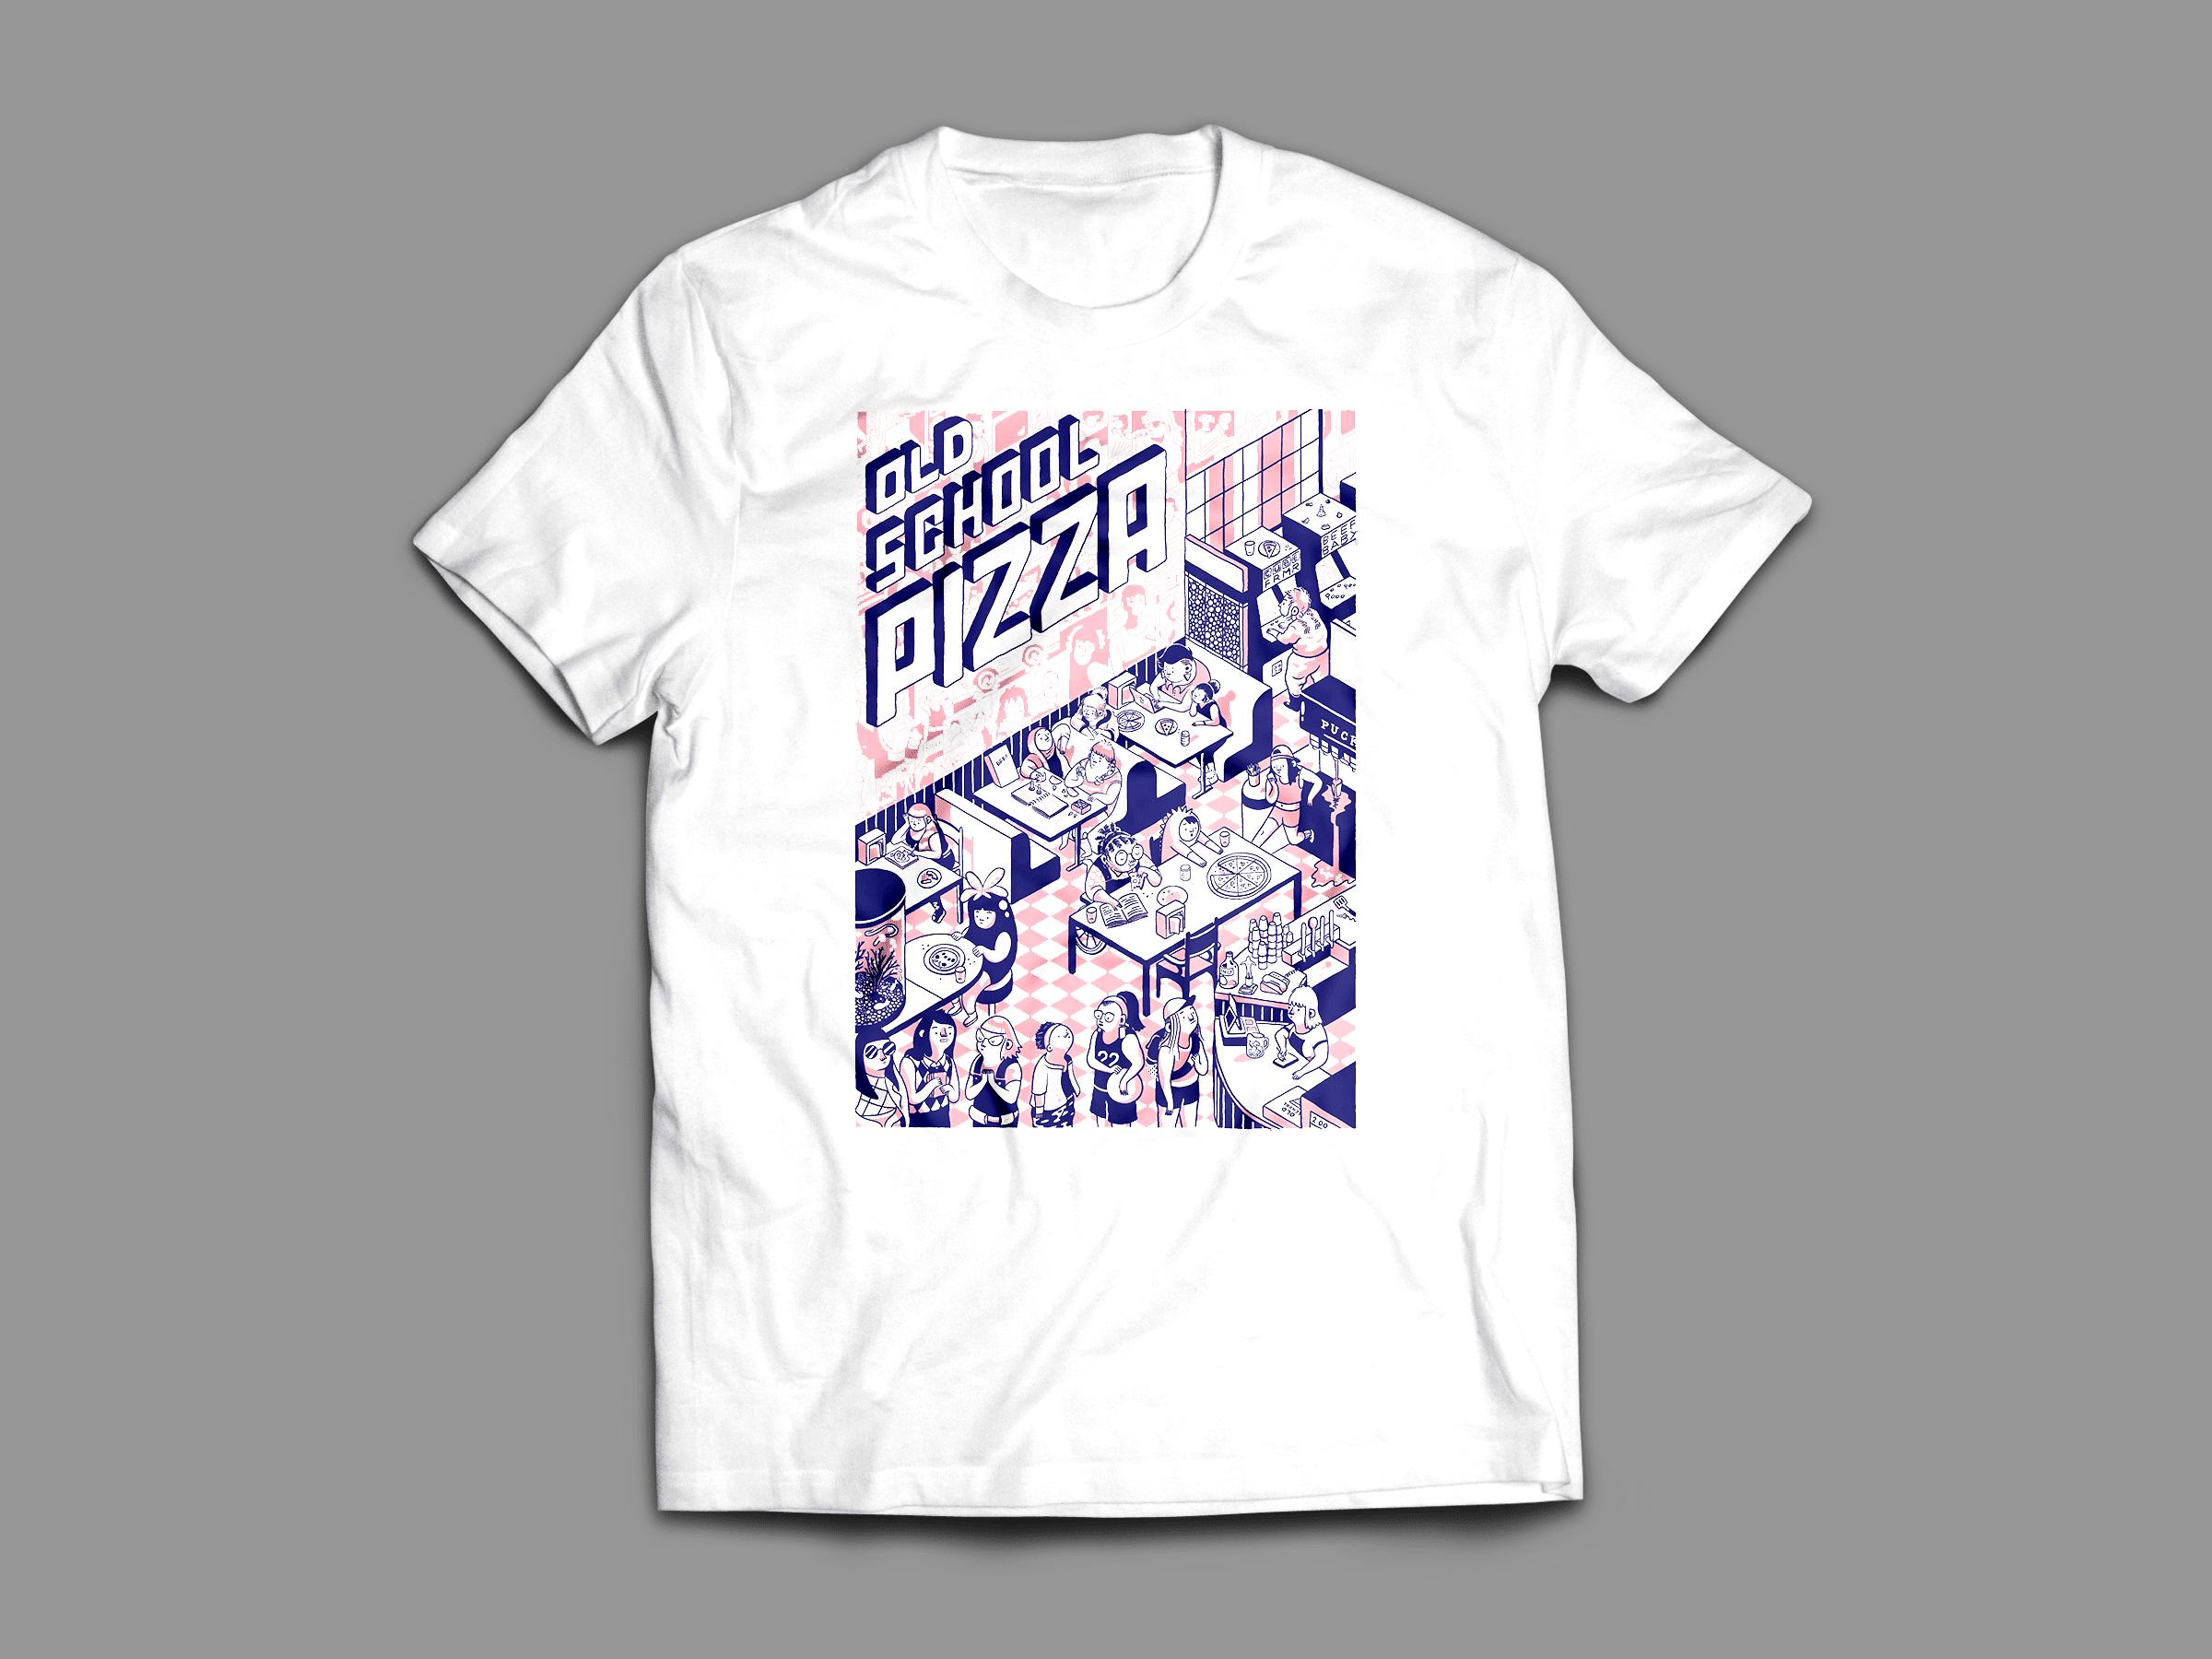 e4511e84 Limited Prints #002 – Pizza Friends – Heart of the Deernicorn